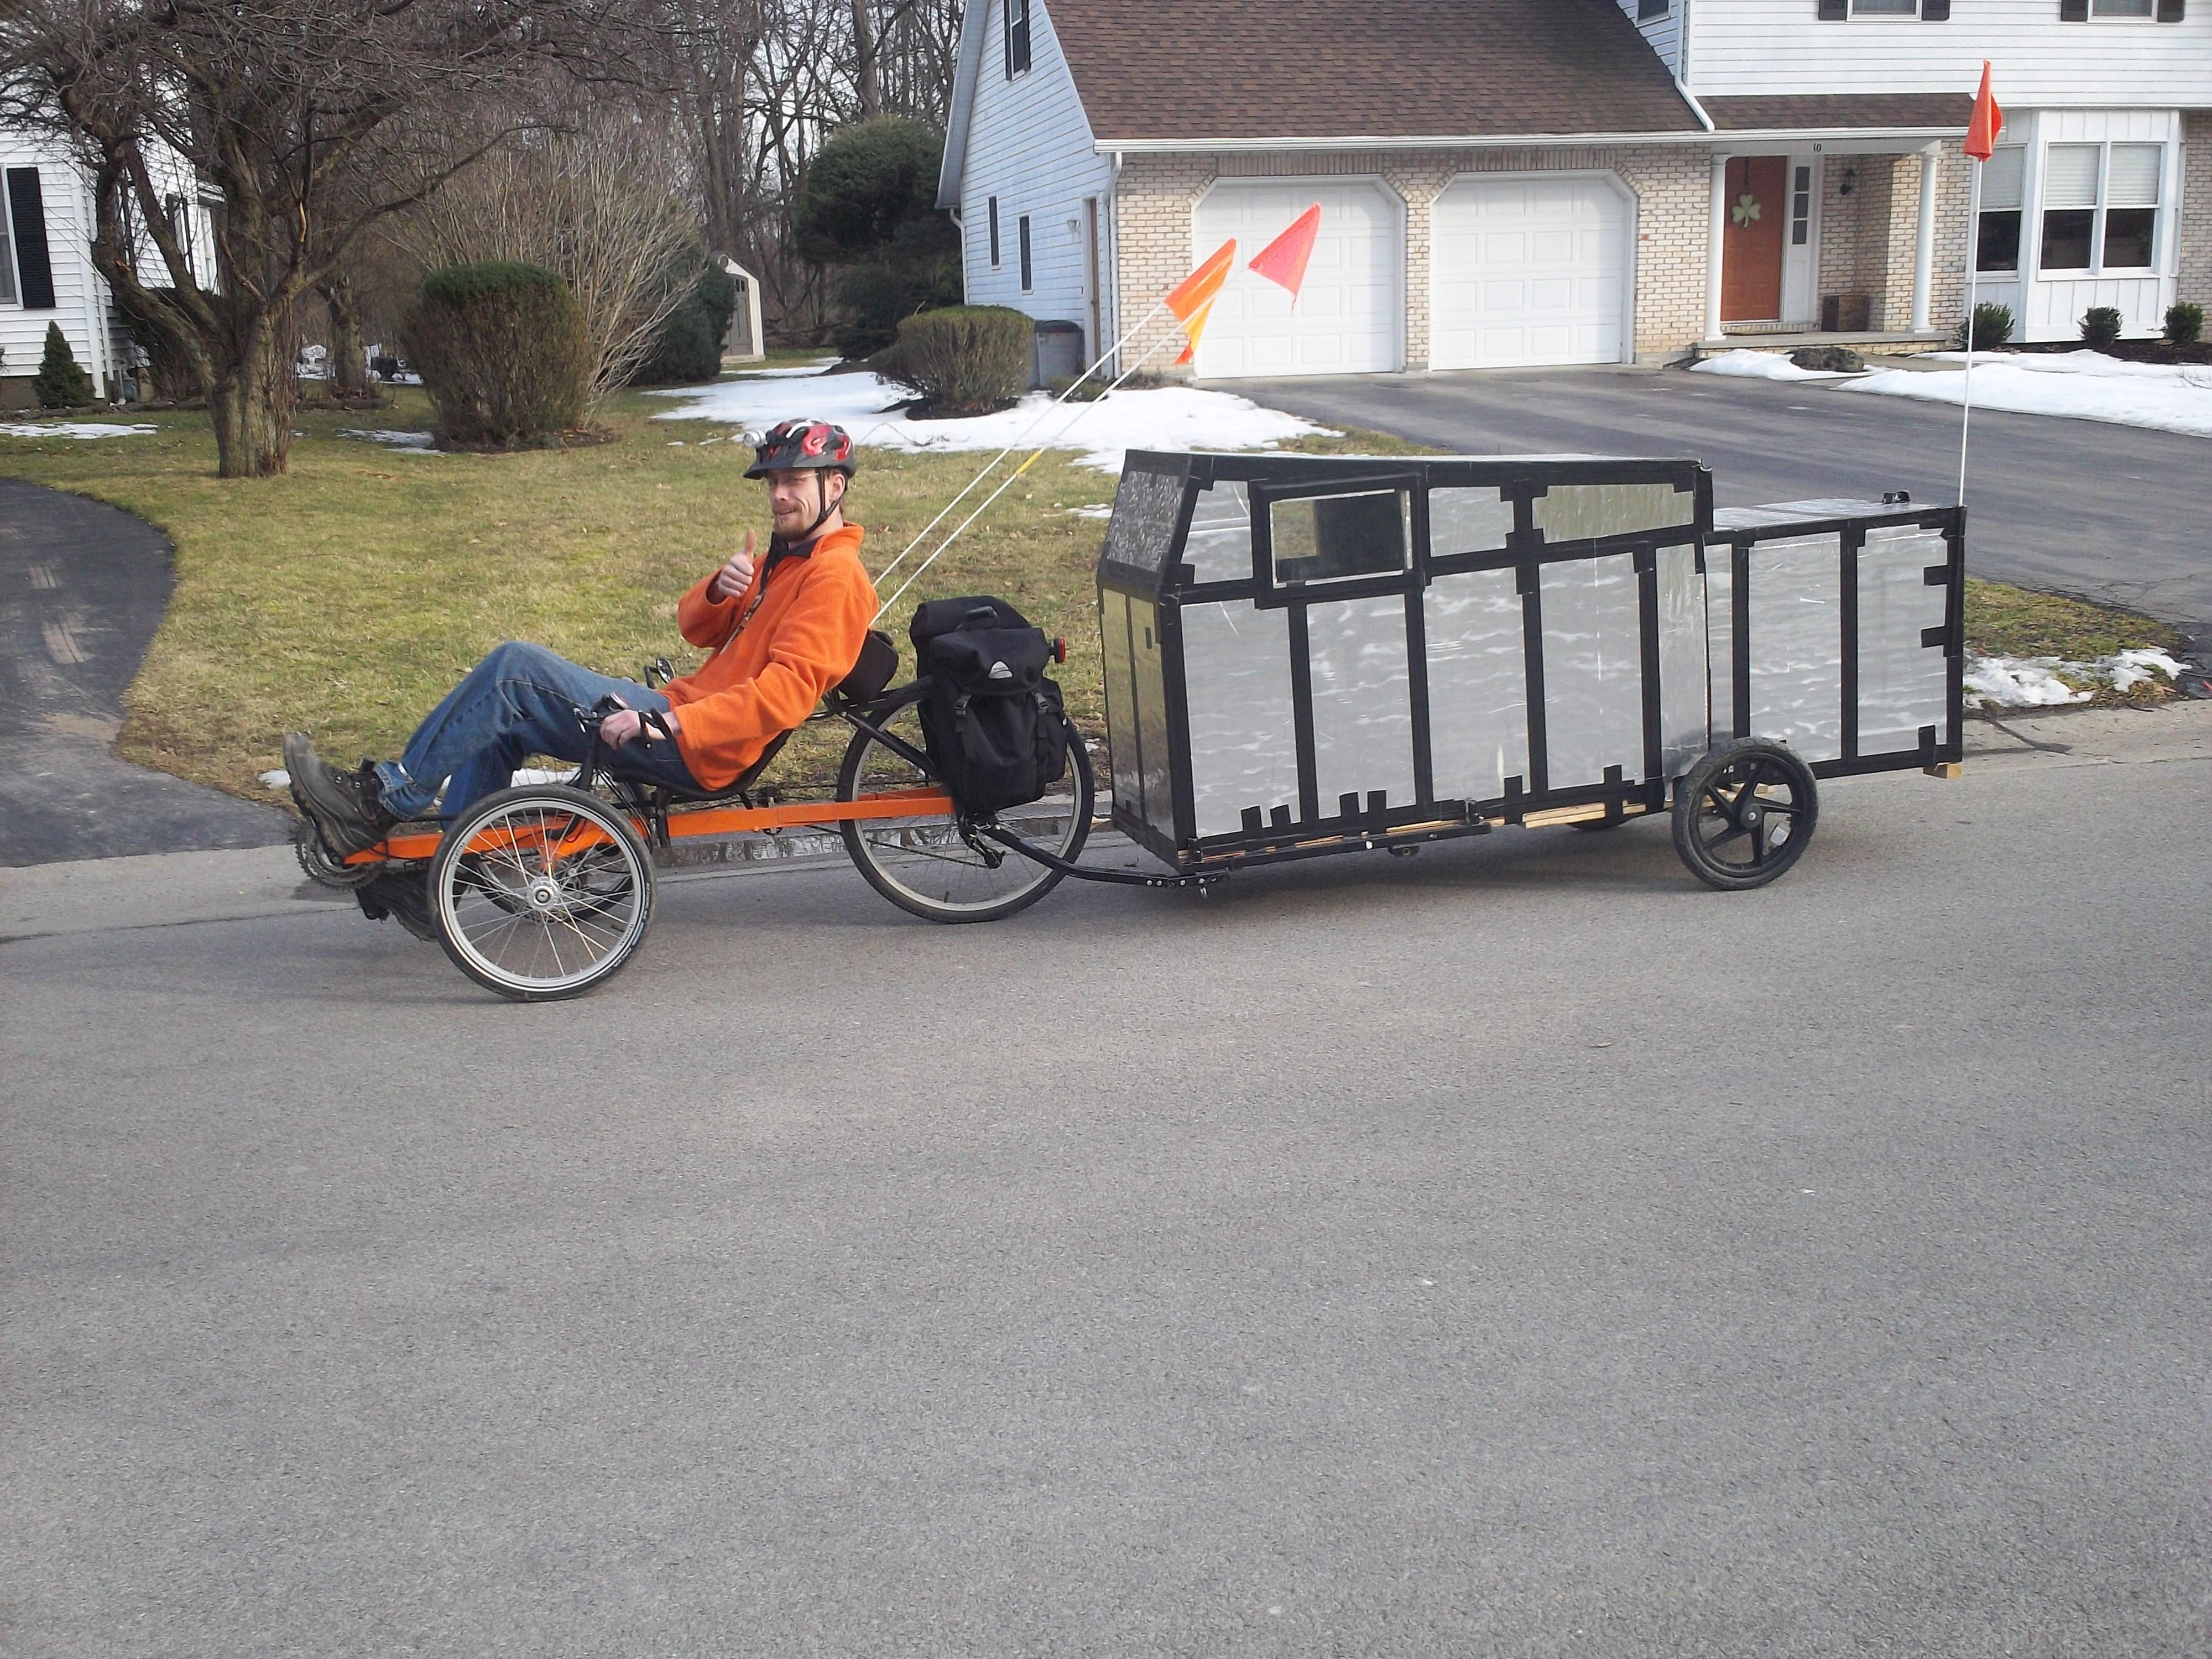 Bike Campers Bicycle Camper Nagginginspiration